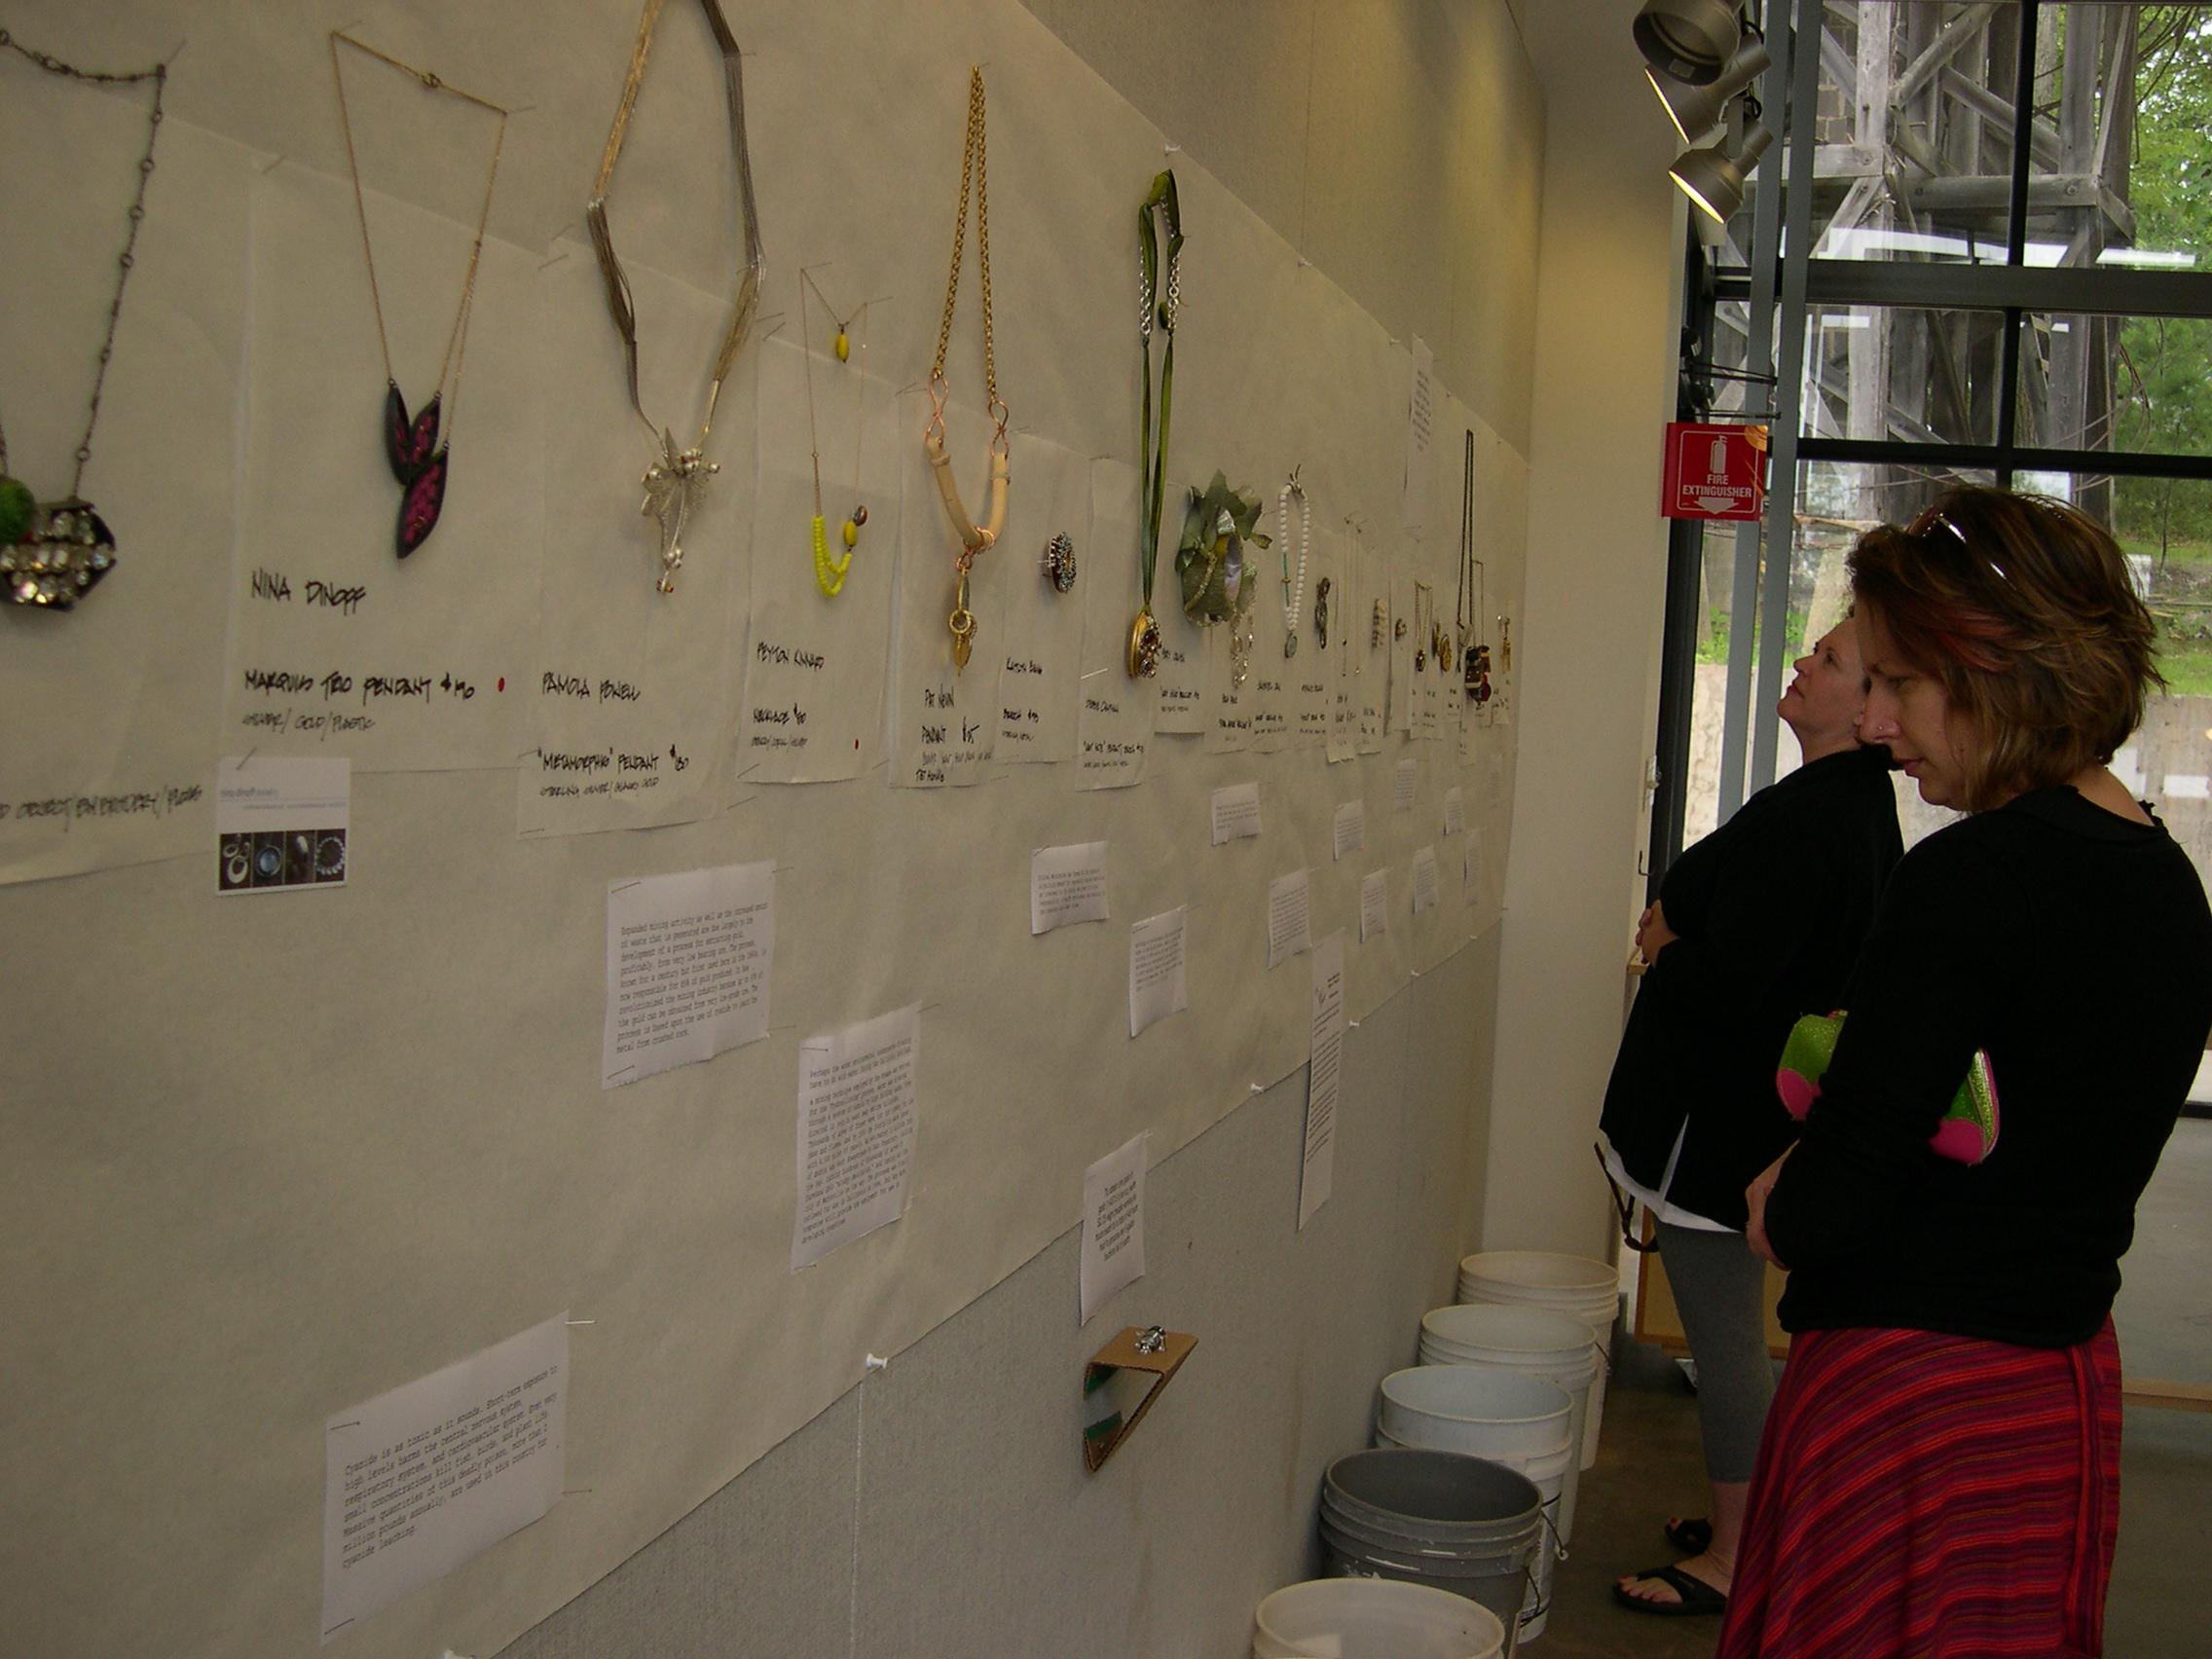 RJM_Penland_exhibition2.JPG